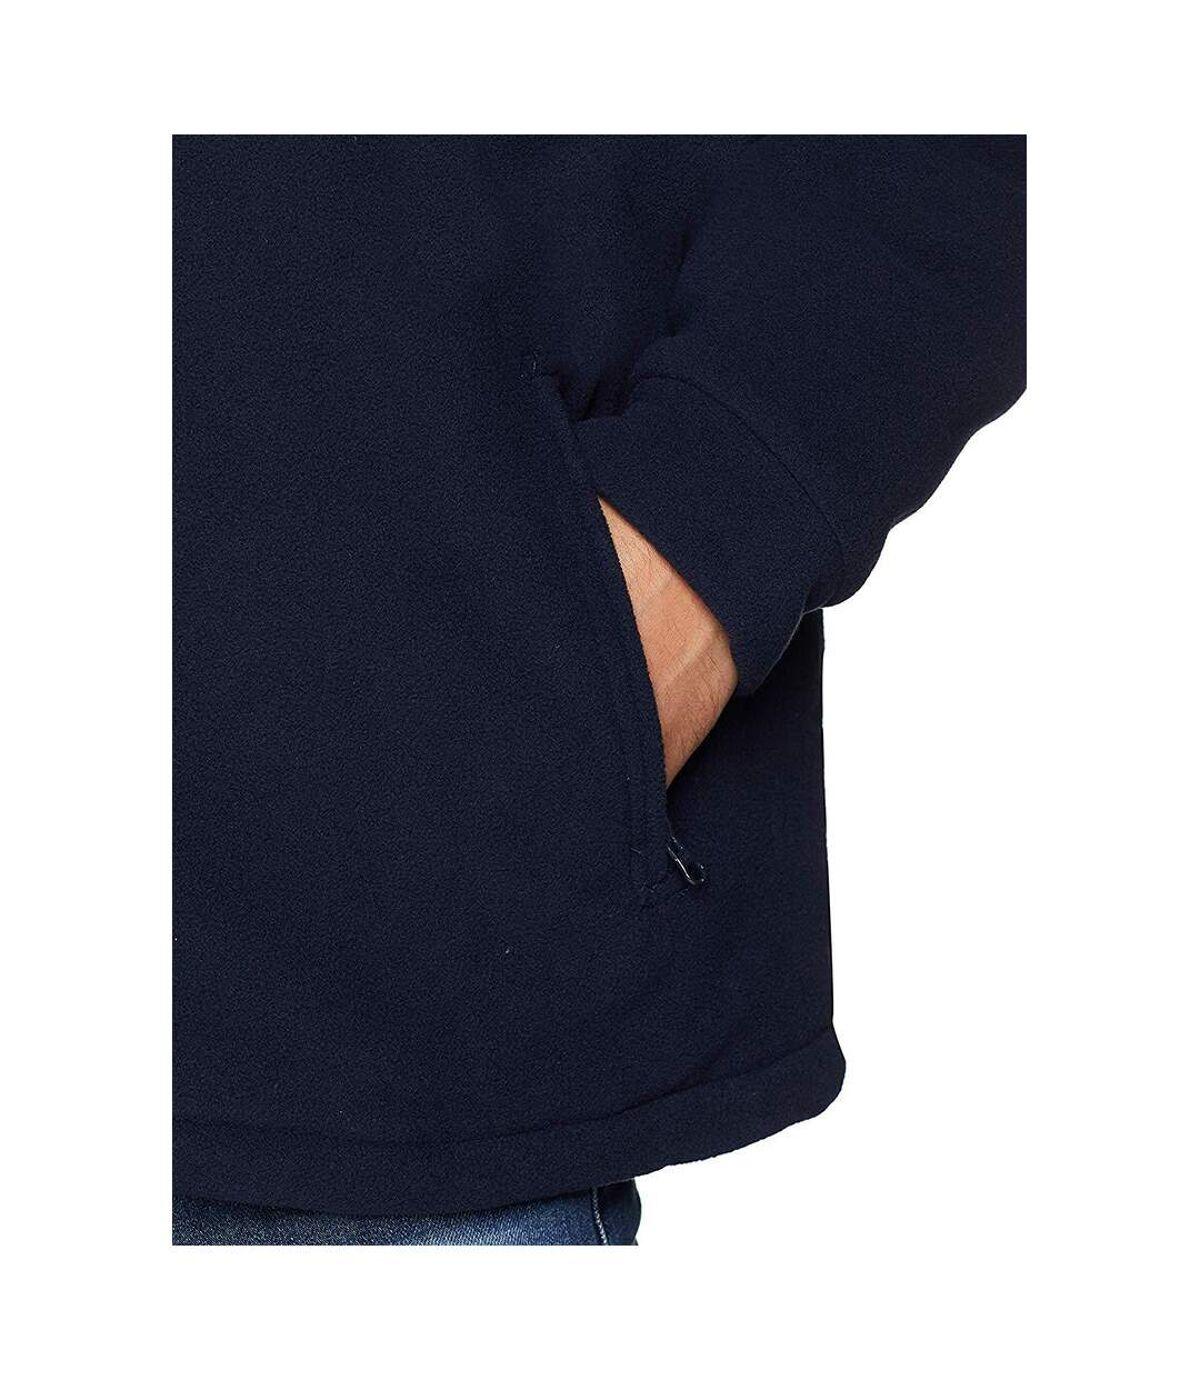 Regatta Mens Asgard II Quilted Fleece Jacket (Thermo-guard Insulation) (Dark Navy) - UTBC823